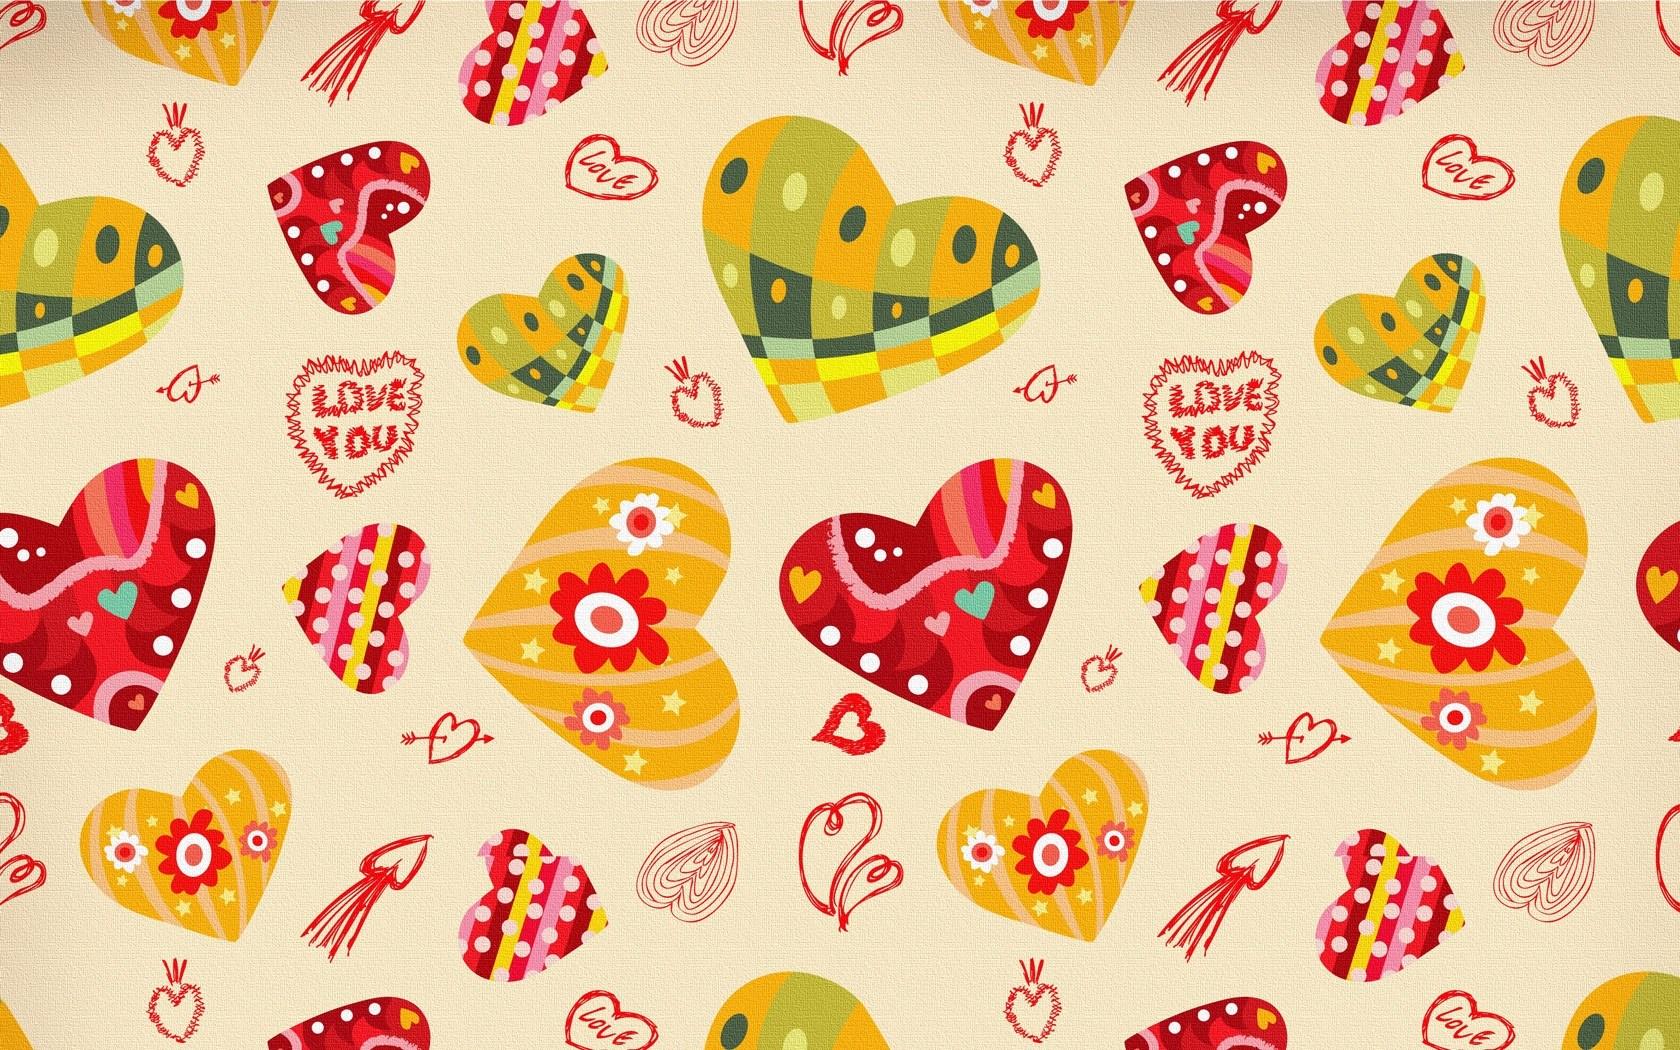 Love Art Hearts Wallpapers 1680x1050 675655